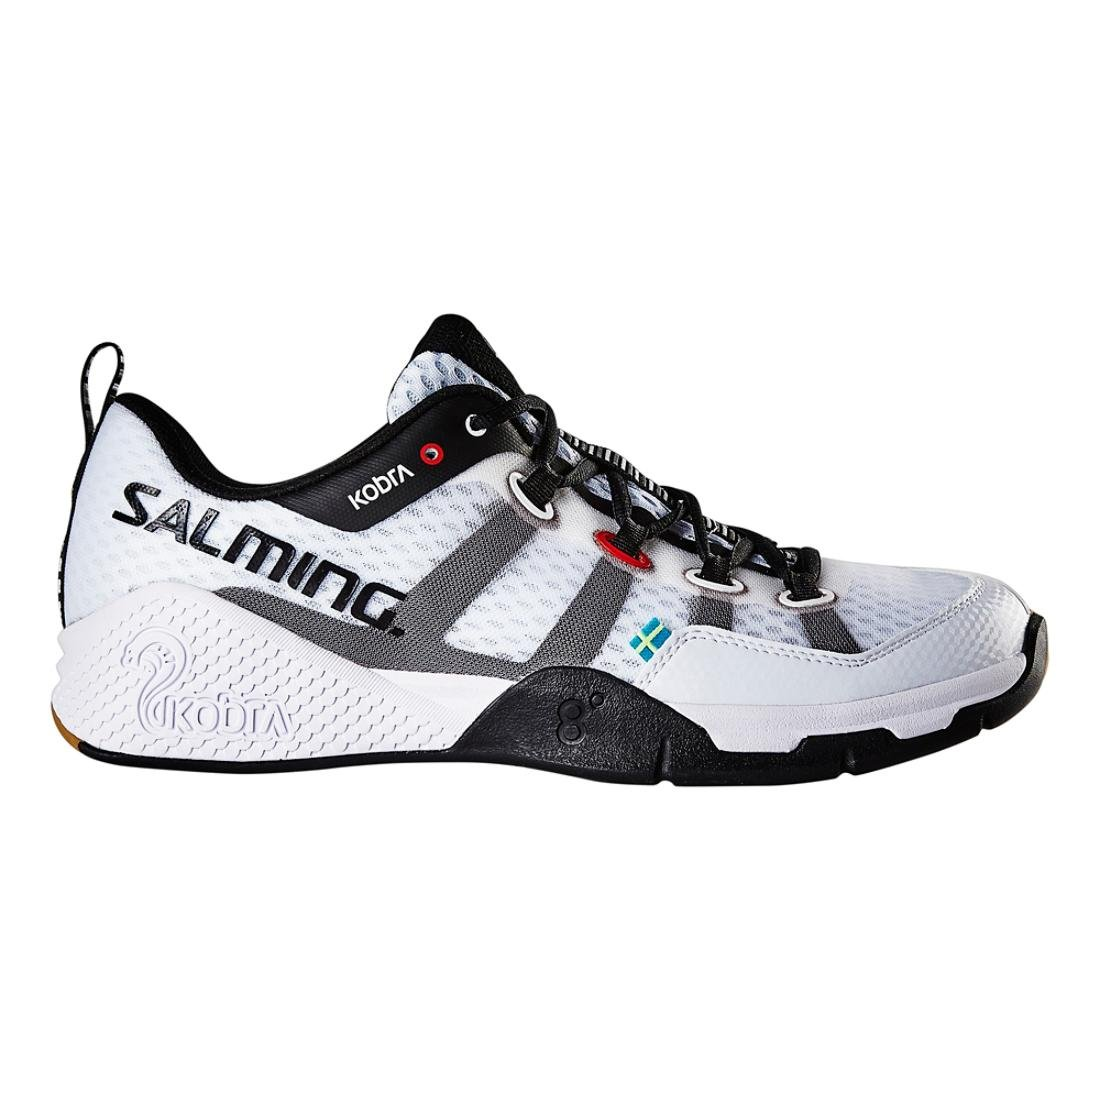 Salming Kobra White Men's Court Shoes